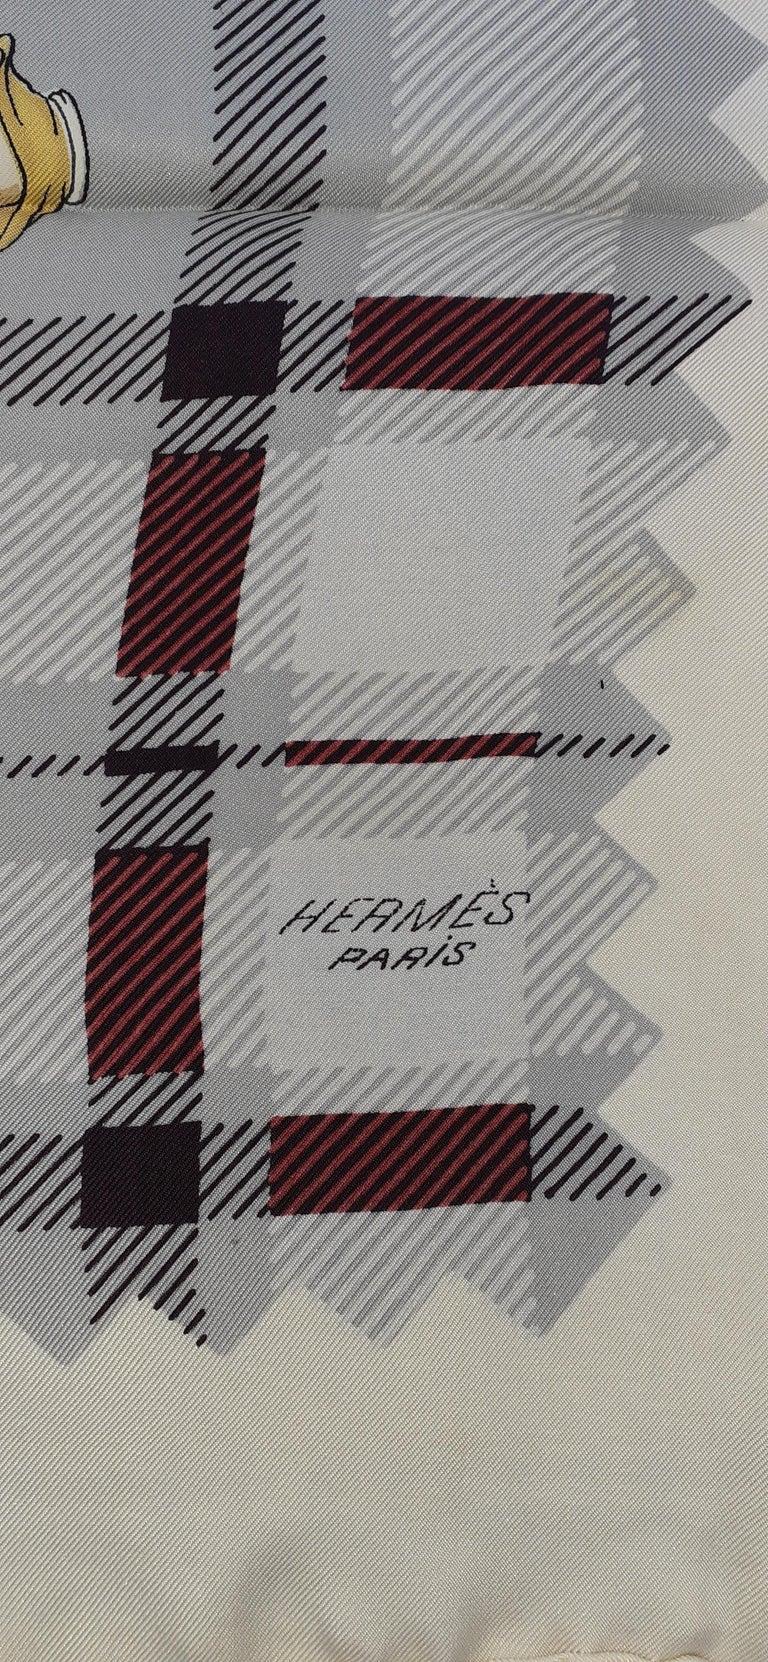 Gray Hermès Vintage Silk Scarf Bagpipe Cornemuse United Kingdom Grygkar 1951 RARE For Sale